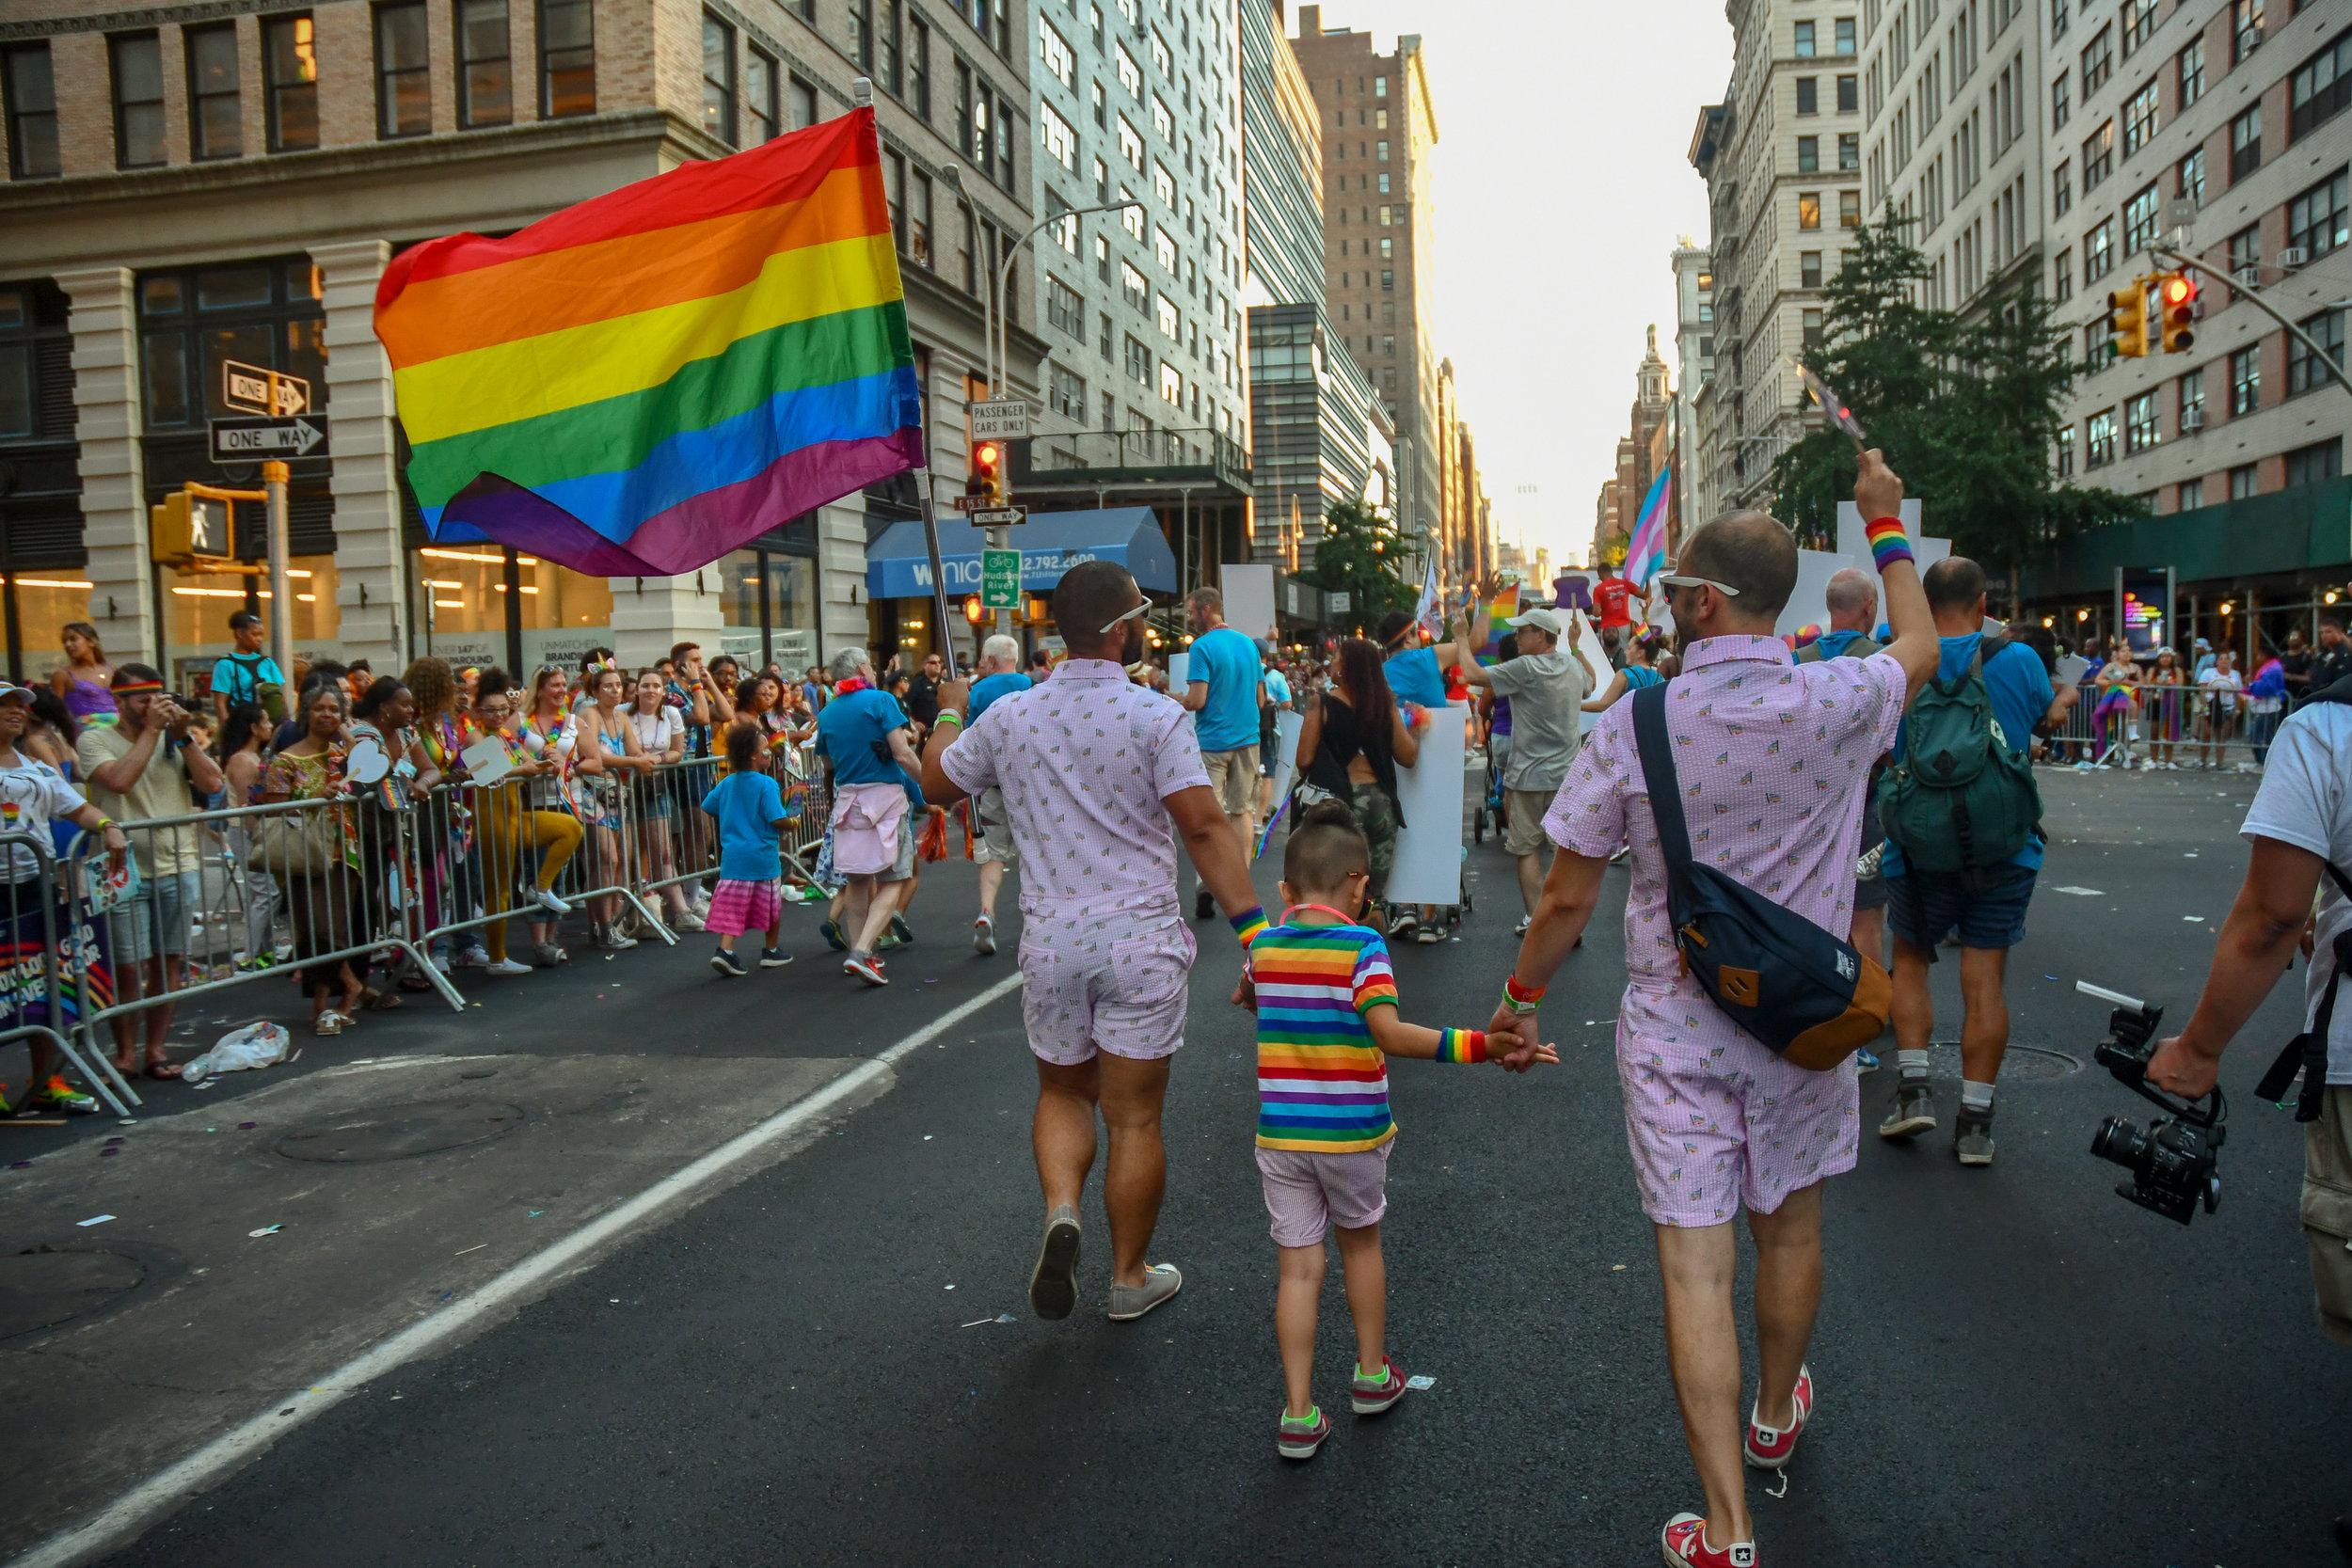 SC-PrideParade-2019_FE-232.jpg